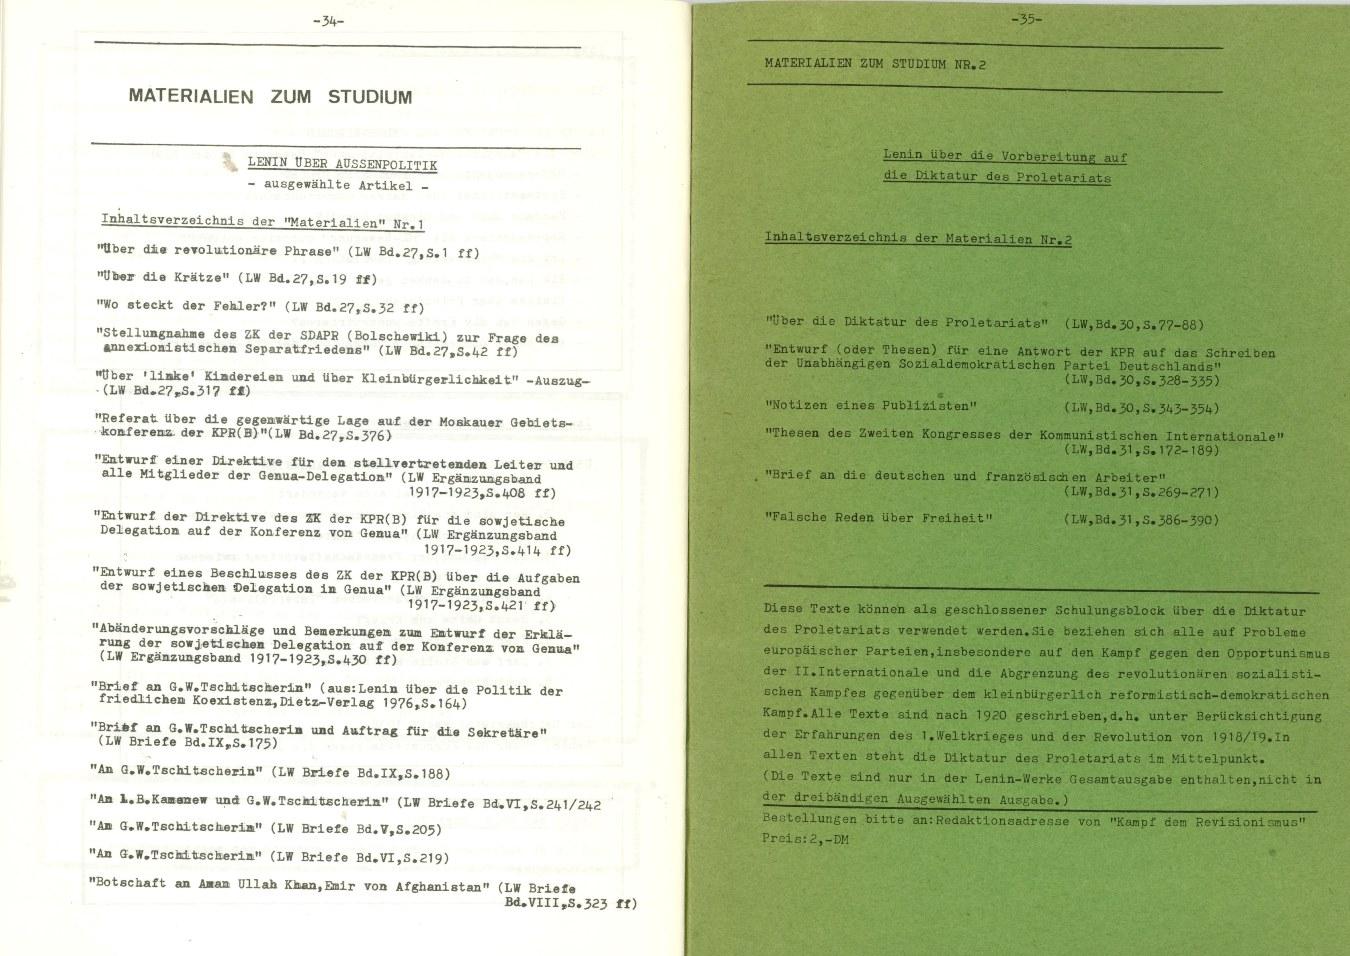 Muenchen_Kampf_dem_Revisionismus_1979_10_18